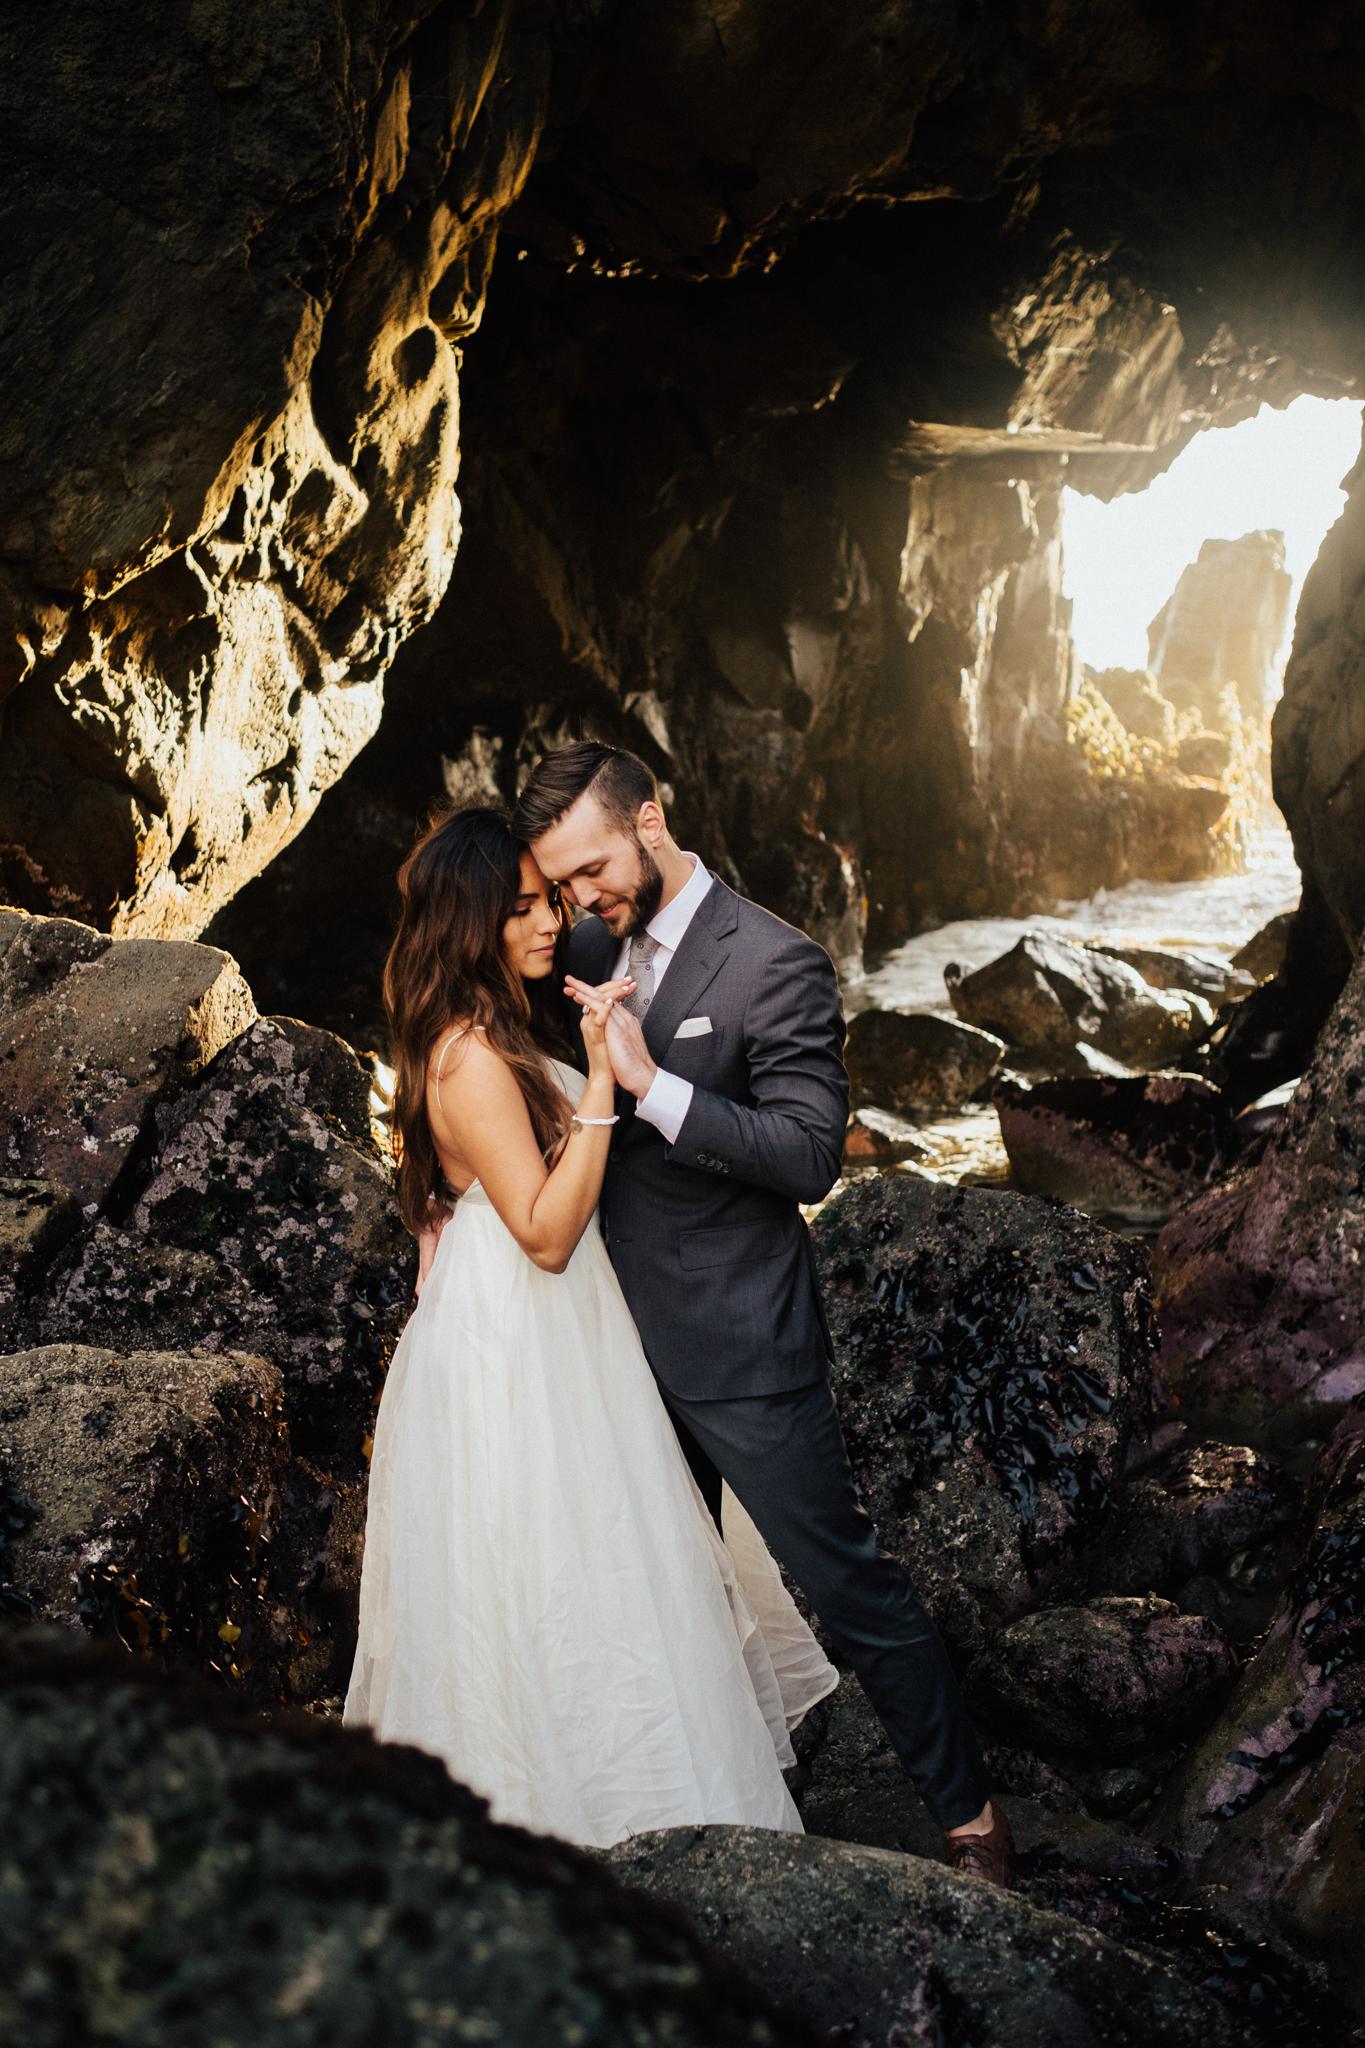 Arizona-Adventure-Elopement-Wedding-Photographer-8.jpg